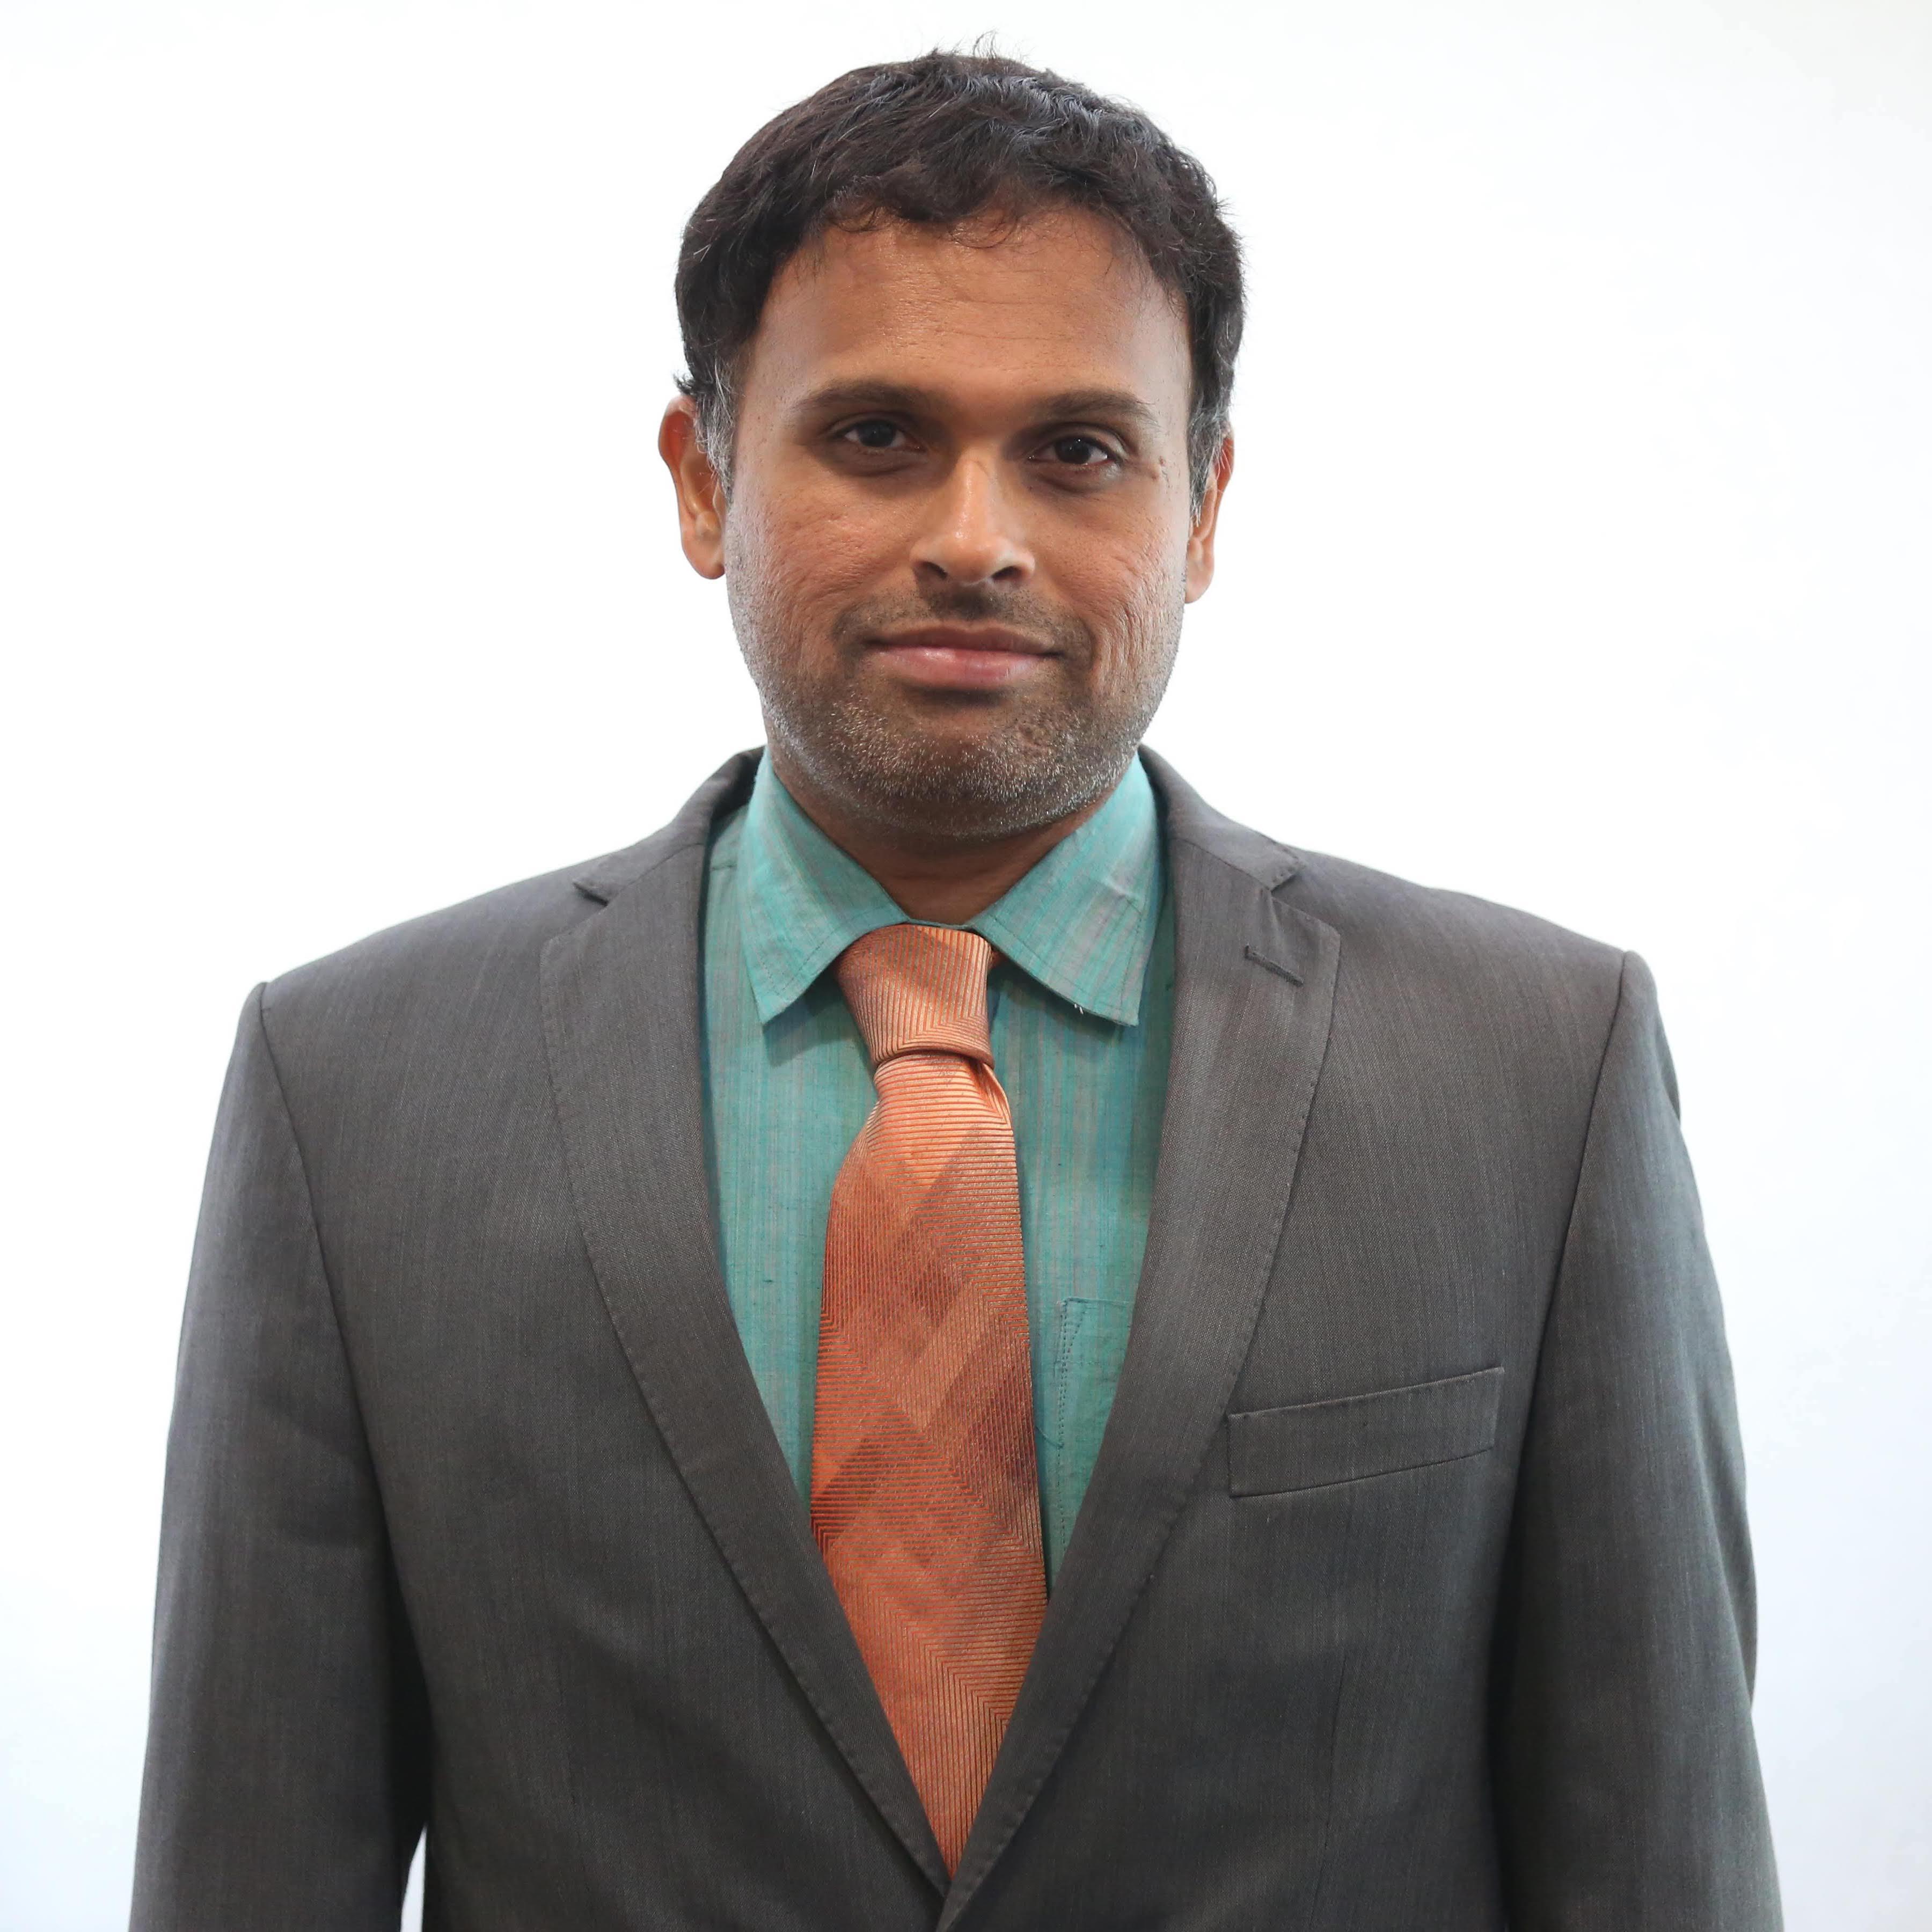 Dr. Sreeram Sundar Chaulia